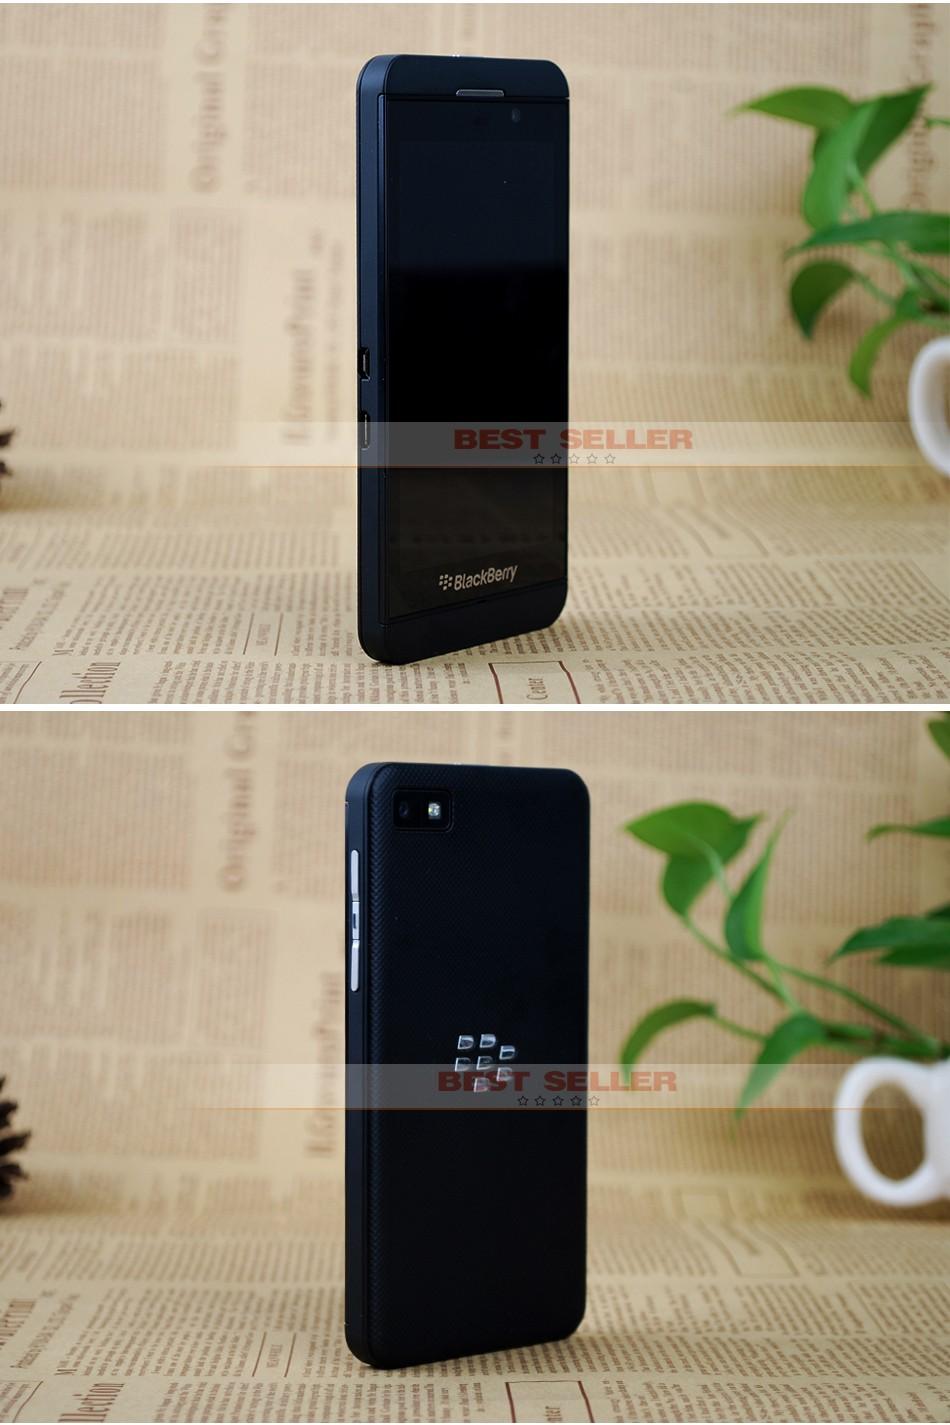 Unlocked Original Blackberry Z10 3G 4G Smartphones NFC GPS WIFI 4.2 inch Touch Mobile Phones 2+16GB white 3